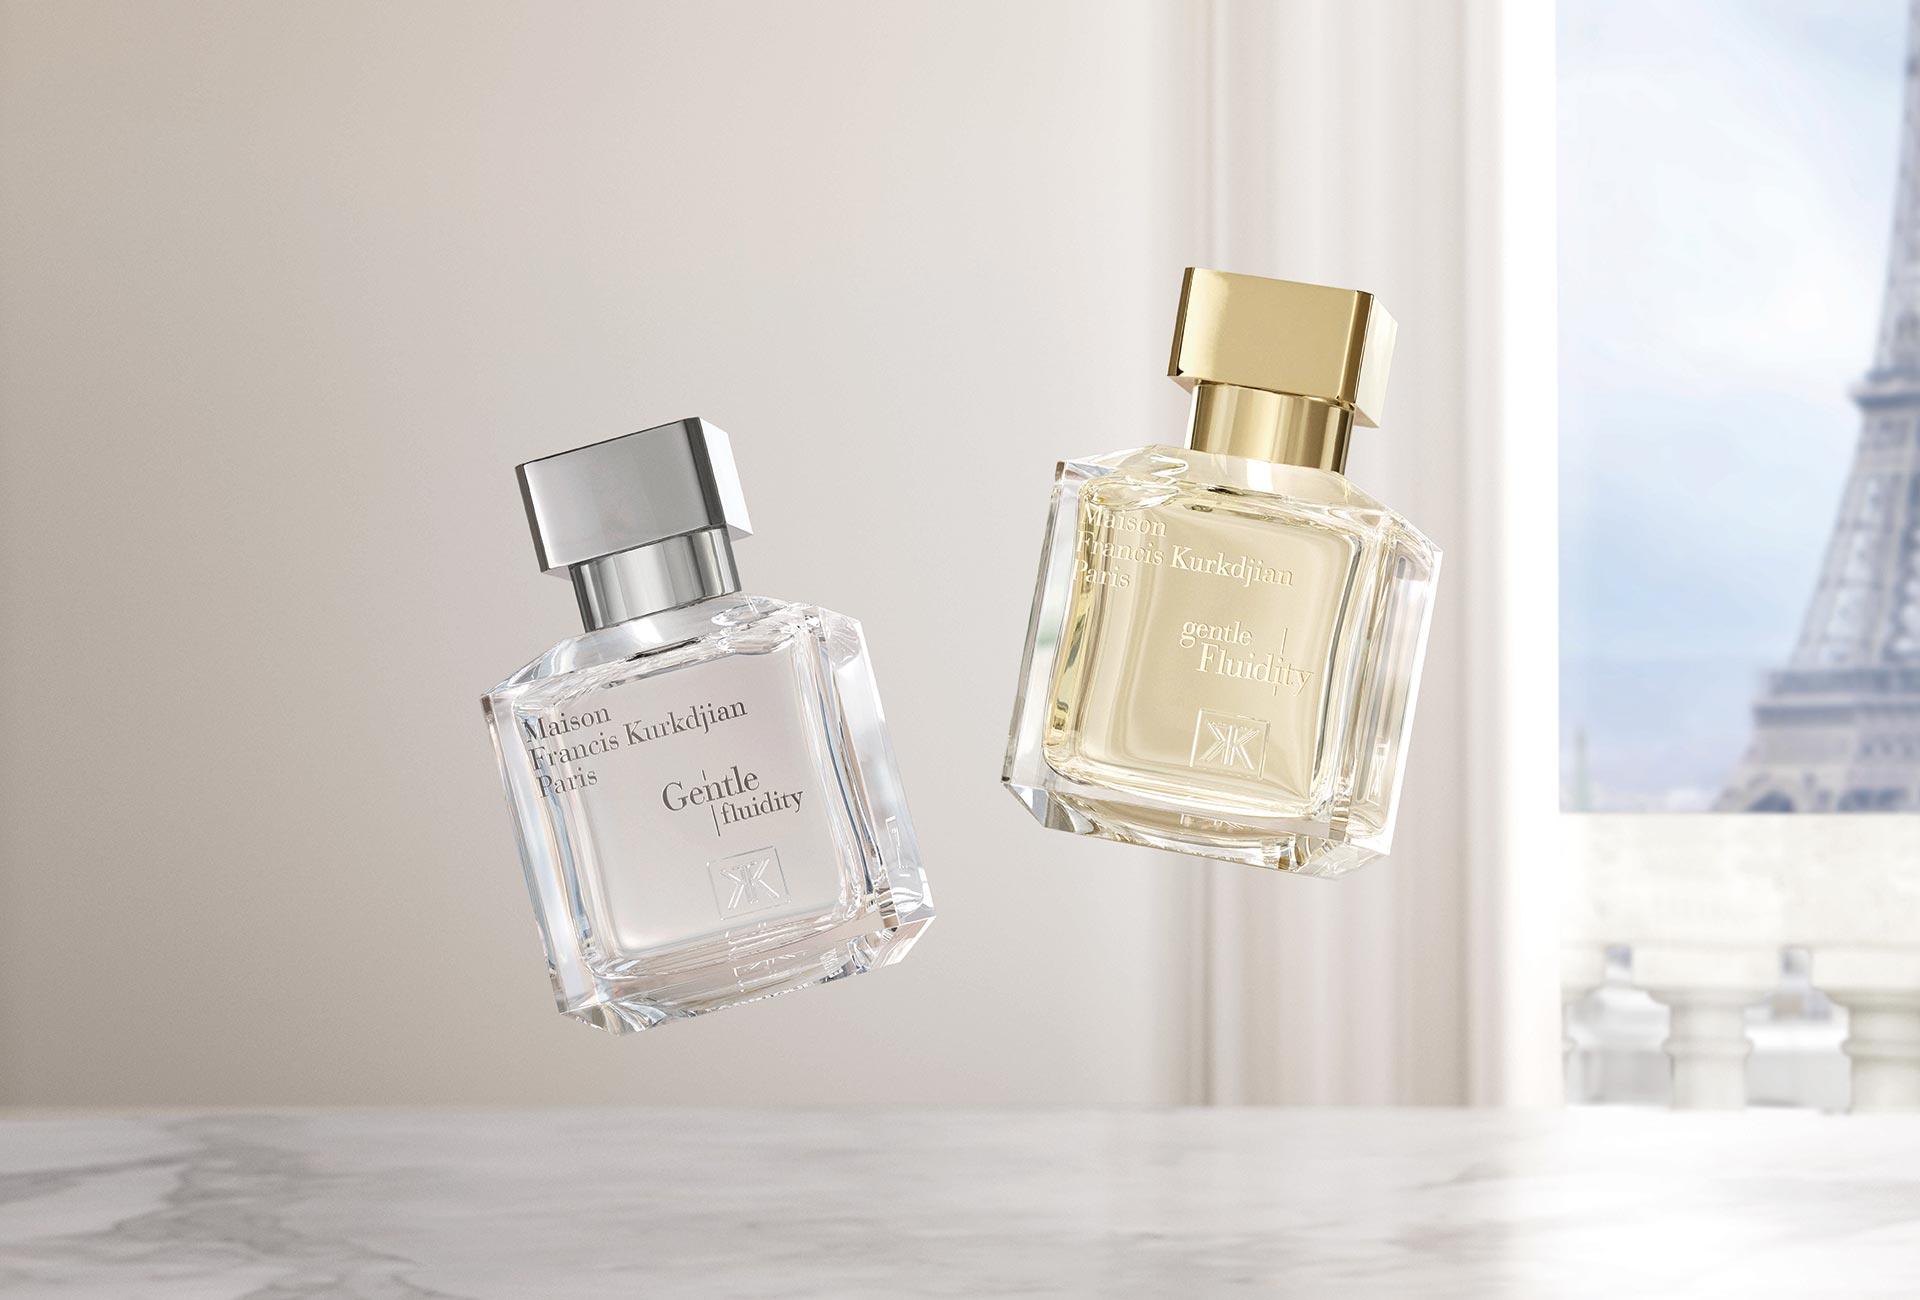 Gentle Kurkdjian C I FluidityFrancis Parfum All EDIH29